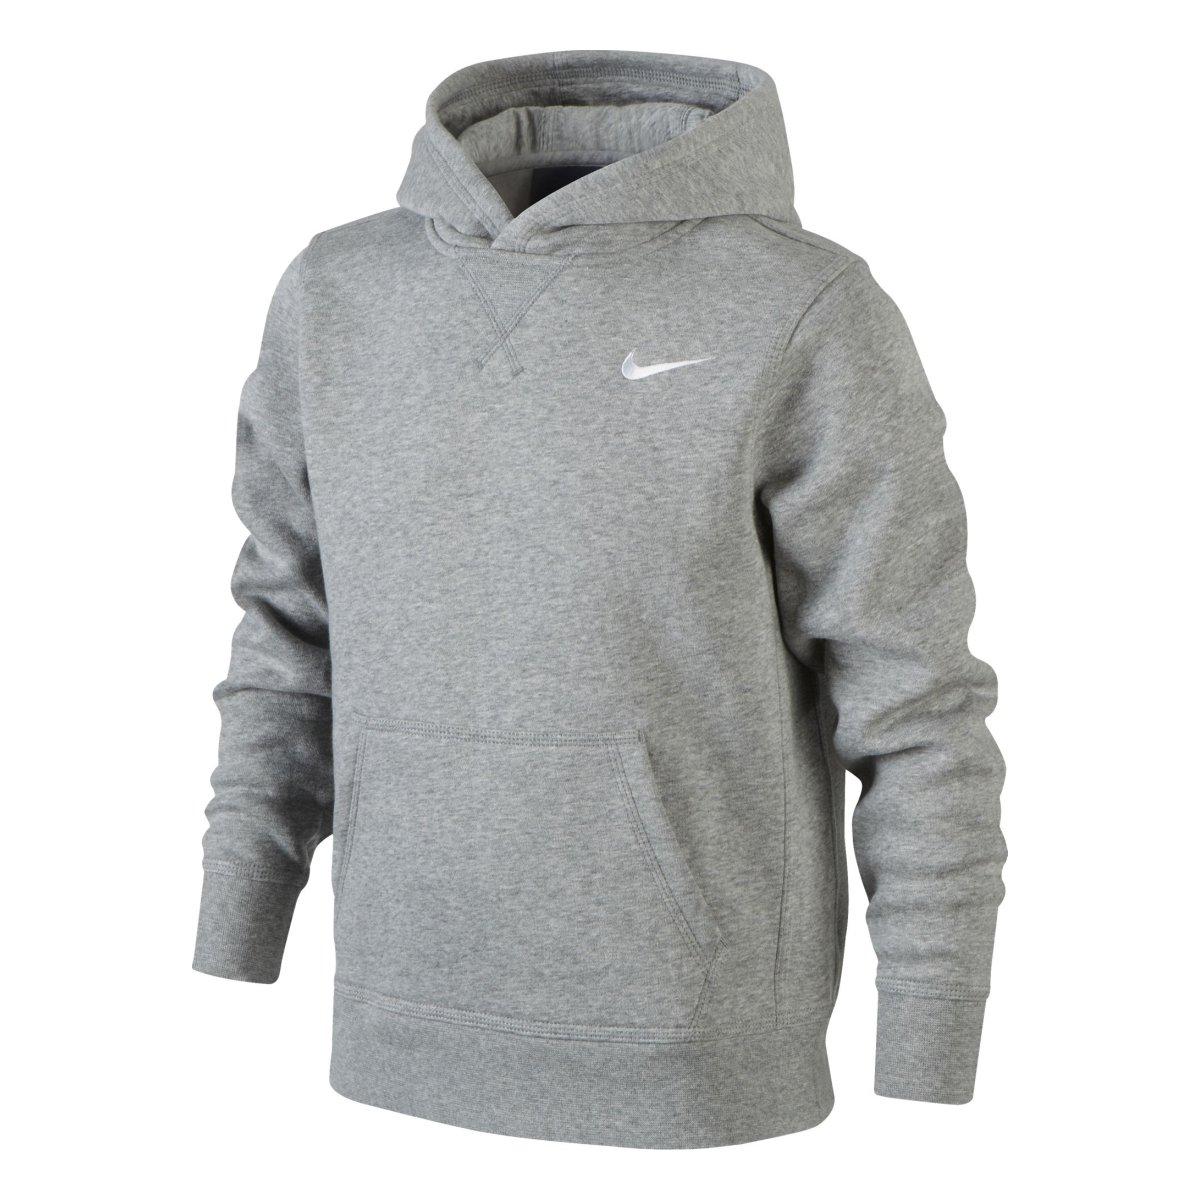 Details zu Nike B Nk Hoodie Ya76 Bf Oth Kinder Sweatshirt Kapuzenpullover 619080 063